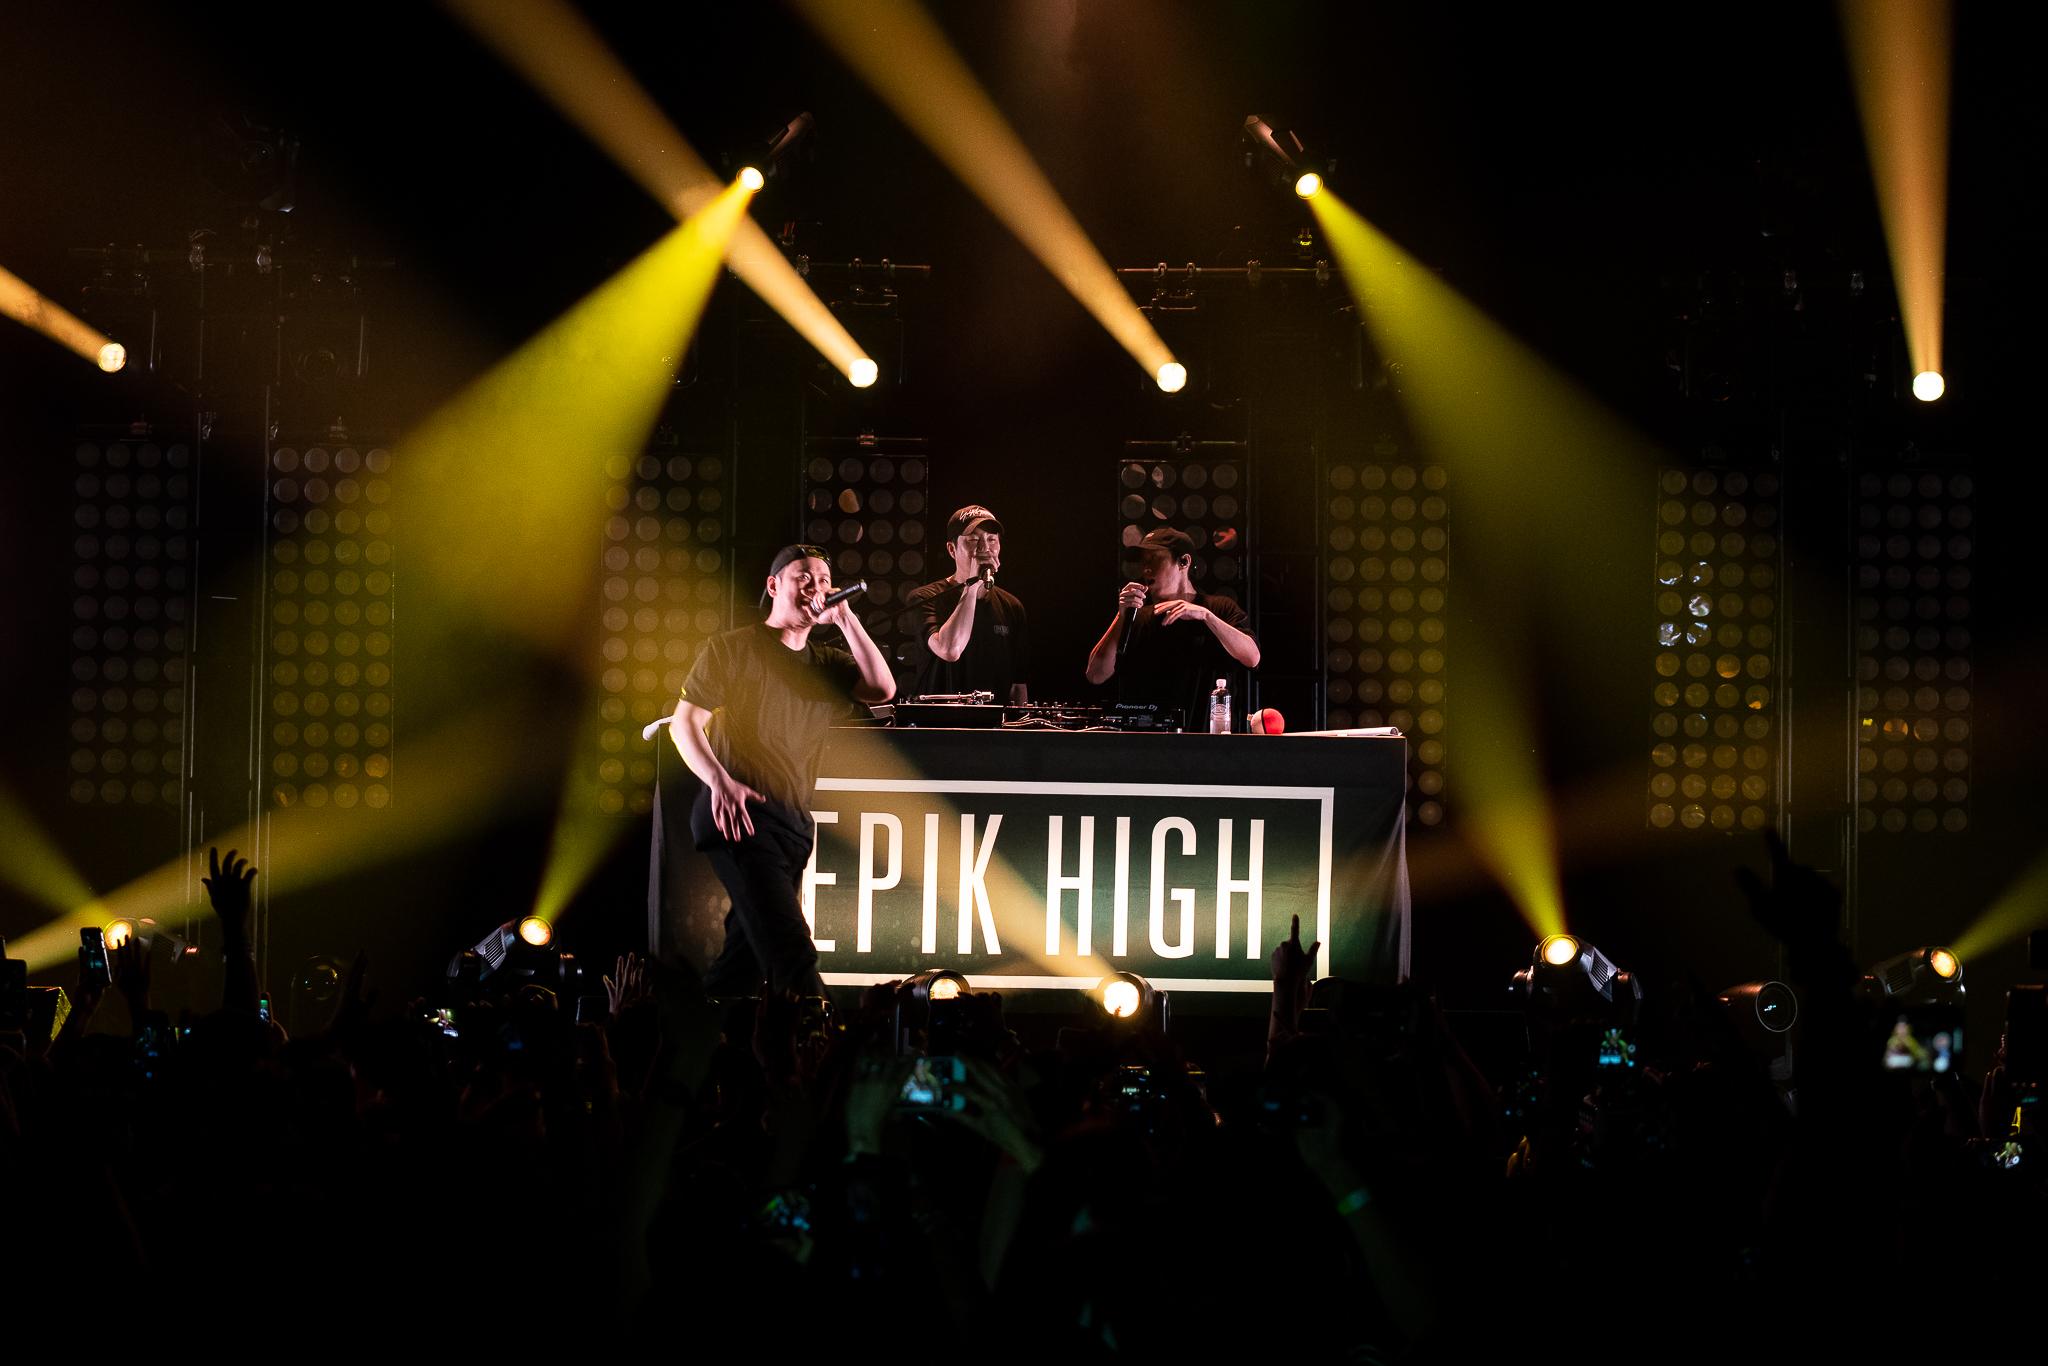 THUMBNAIL - Epik High.jpg